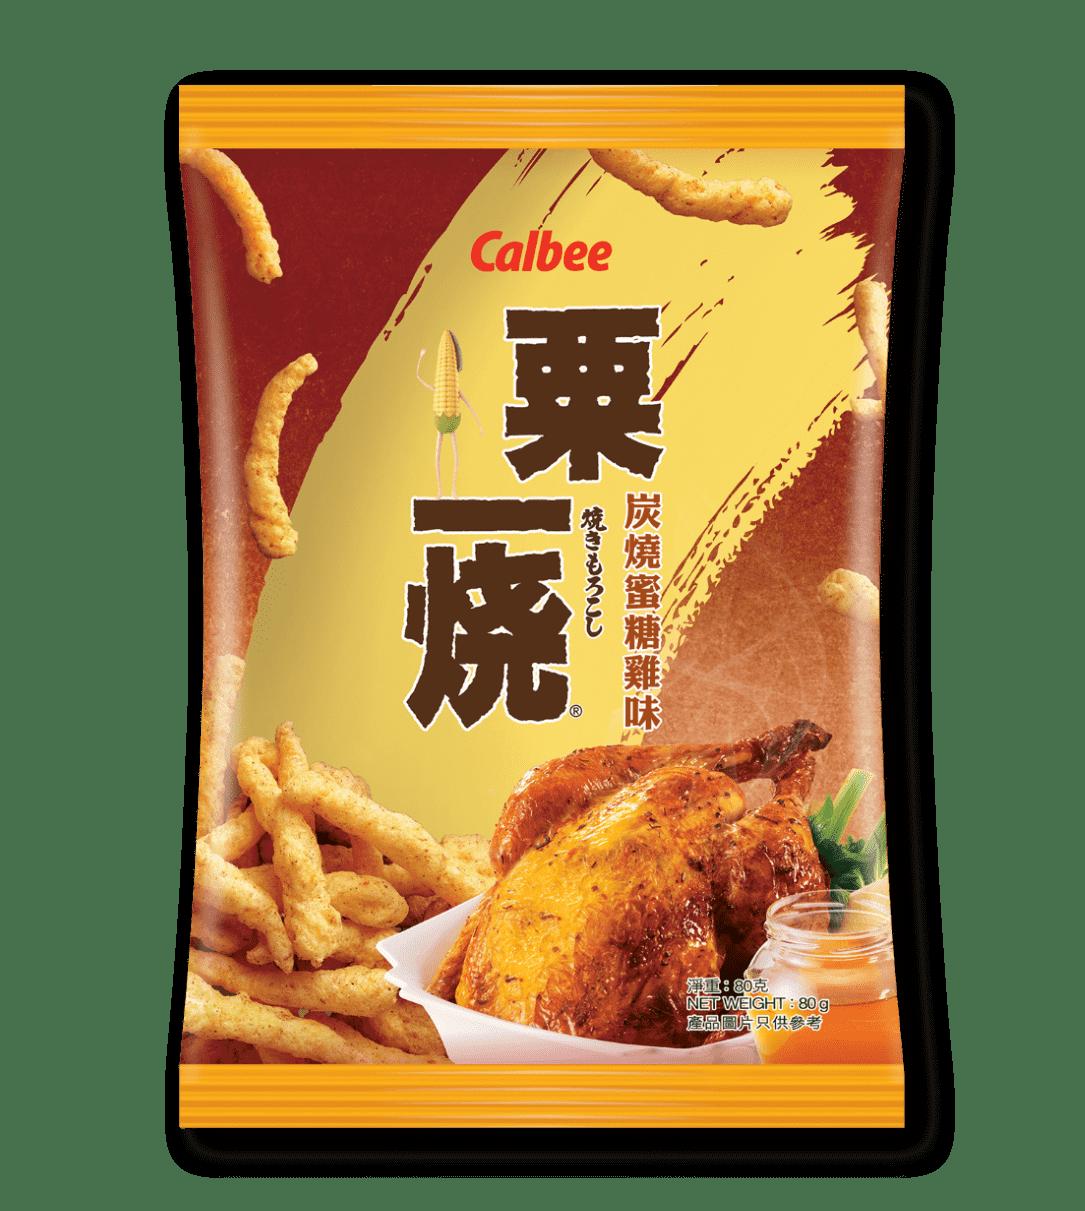 Calbee Australia - World Foods - Grill-A-Corn - Roast Chicken